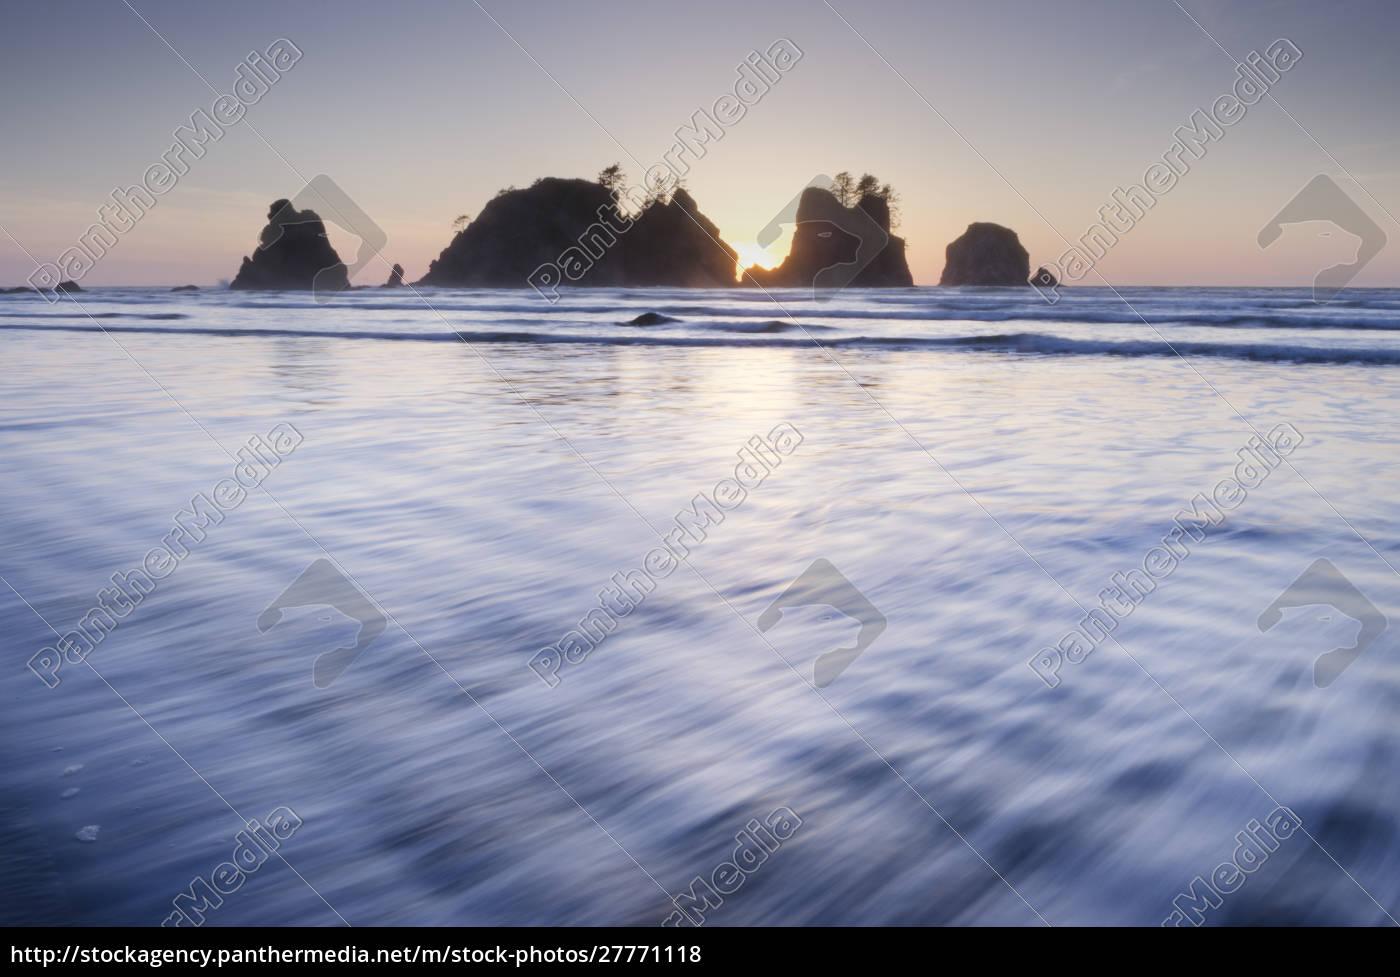 sonnenuntergang, am, shi, shi, beach, meeresstapel, von - 27771118